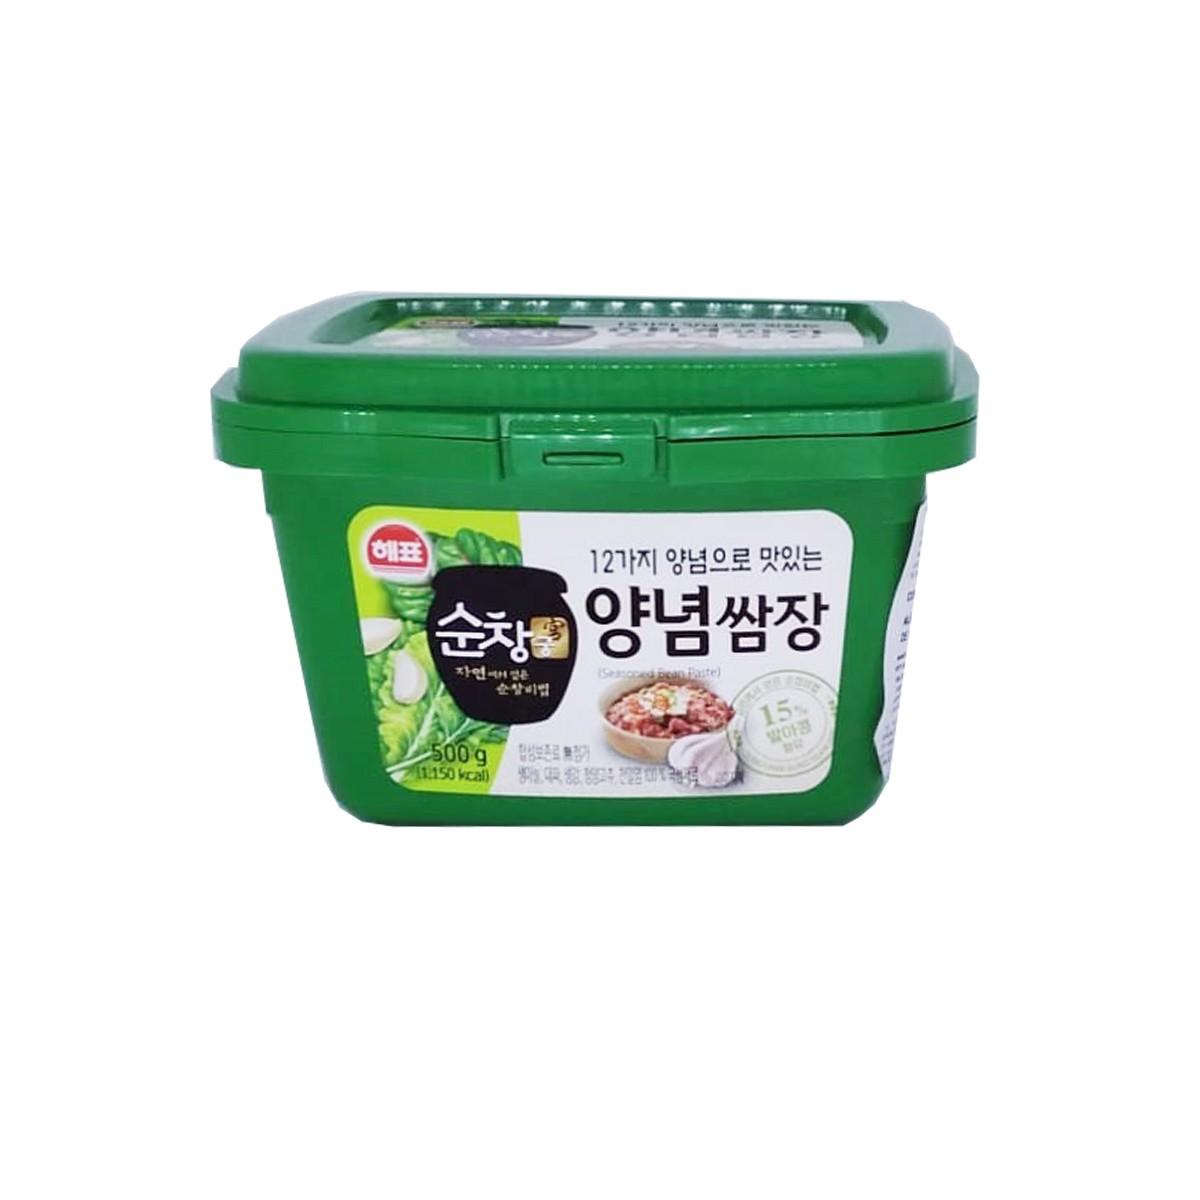 Pasta de Soja Coreano Temperado Ssamjang 500g - Sajo